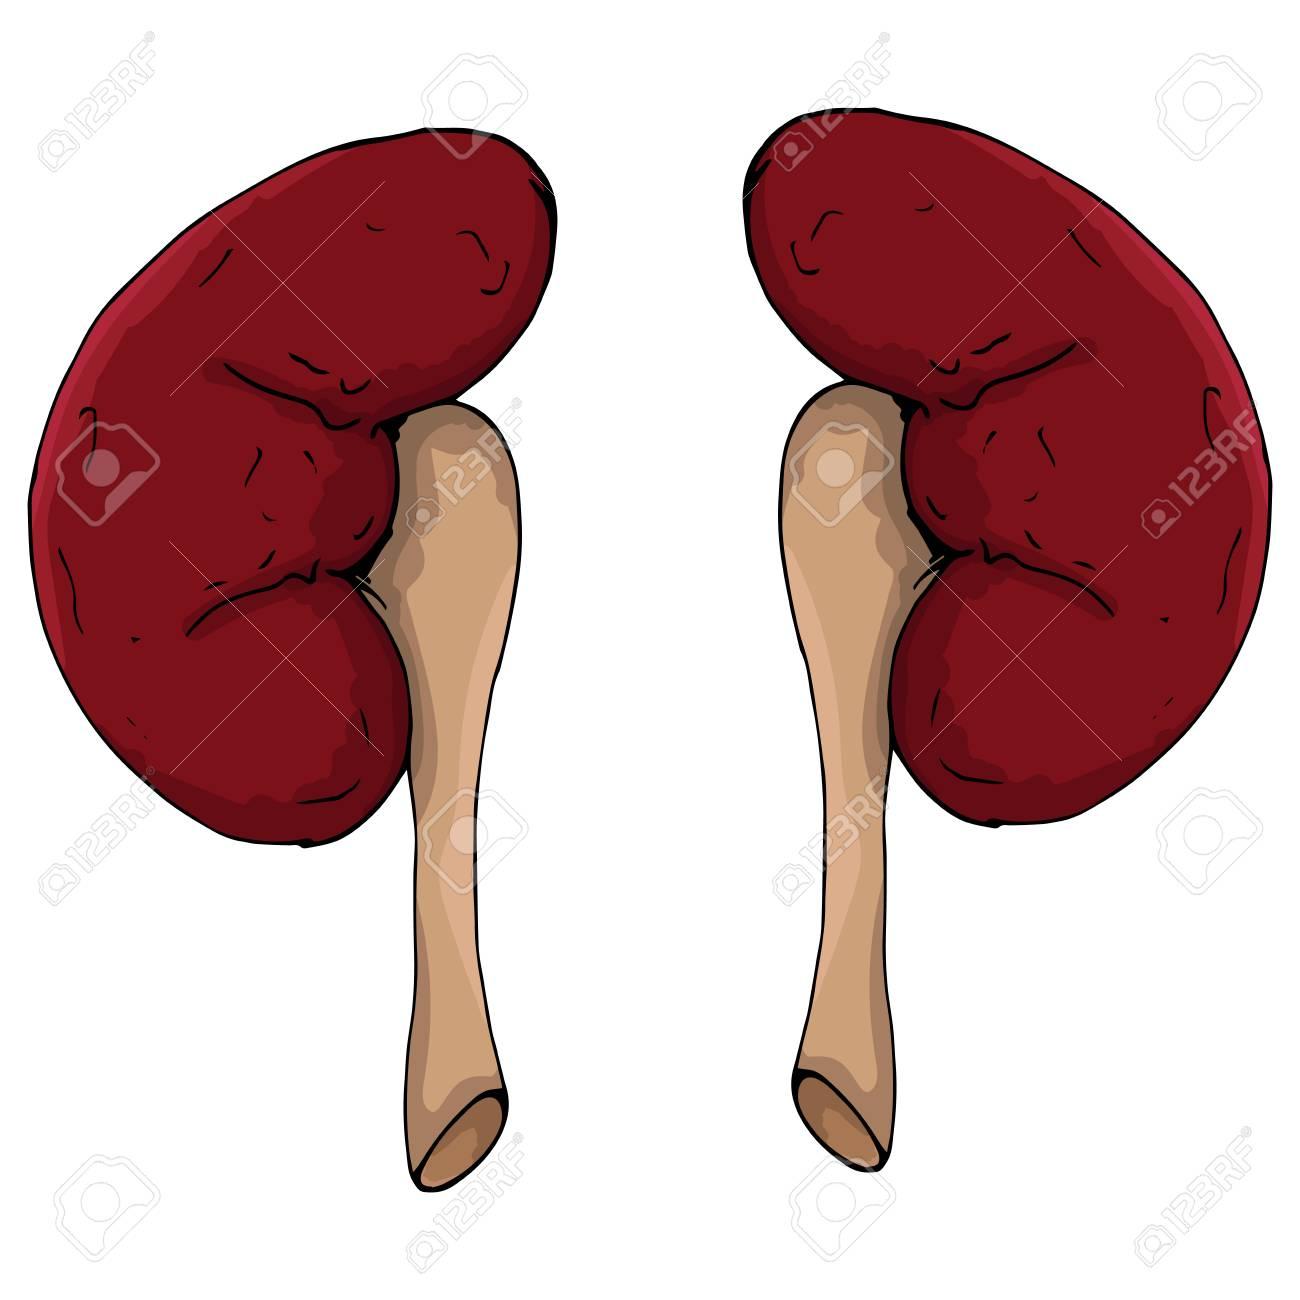 Human Kidneys Vector Illustration Of A Kidney Man Human Anatomy